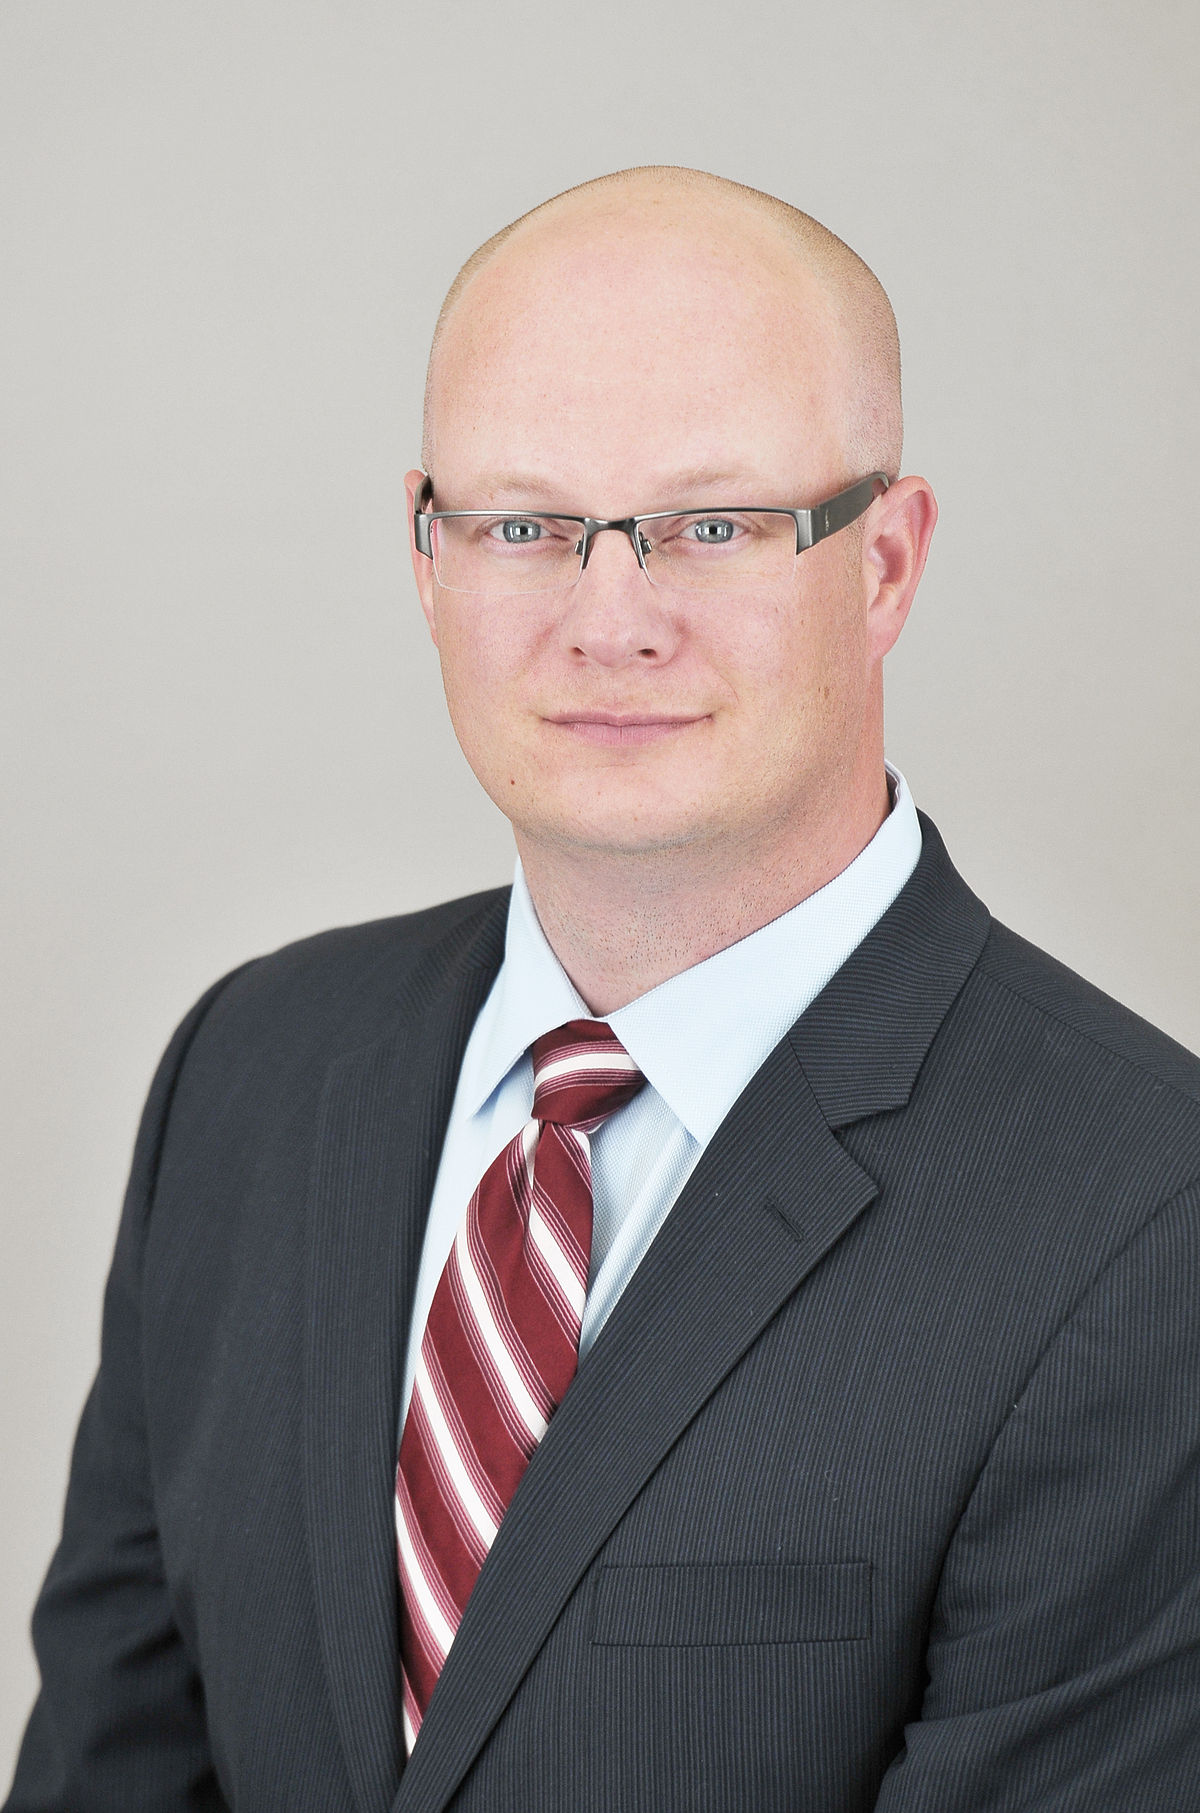 Jeff Wilson Politician Wikipedia